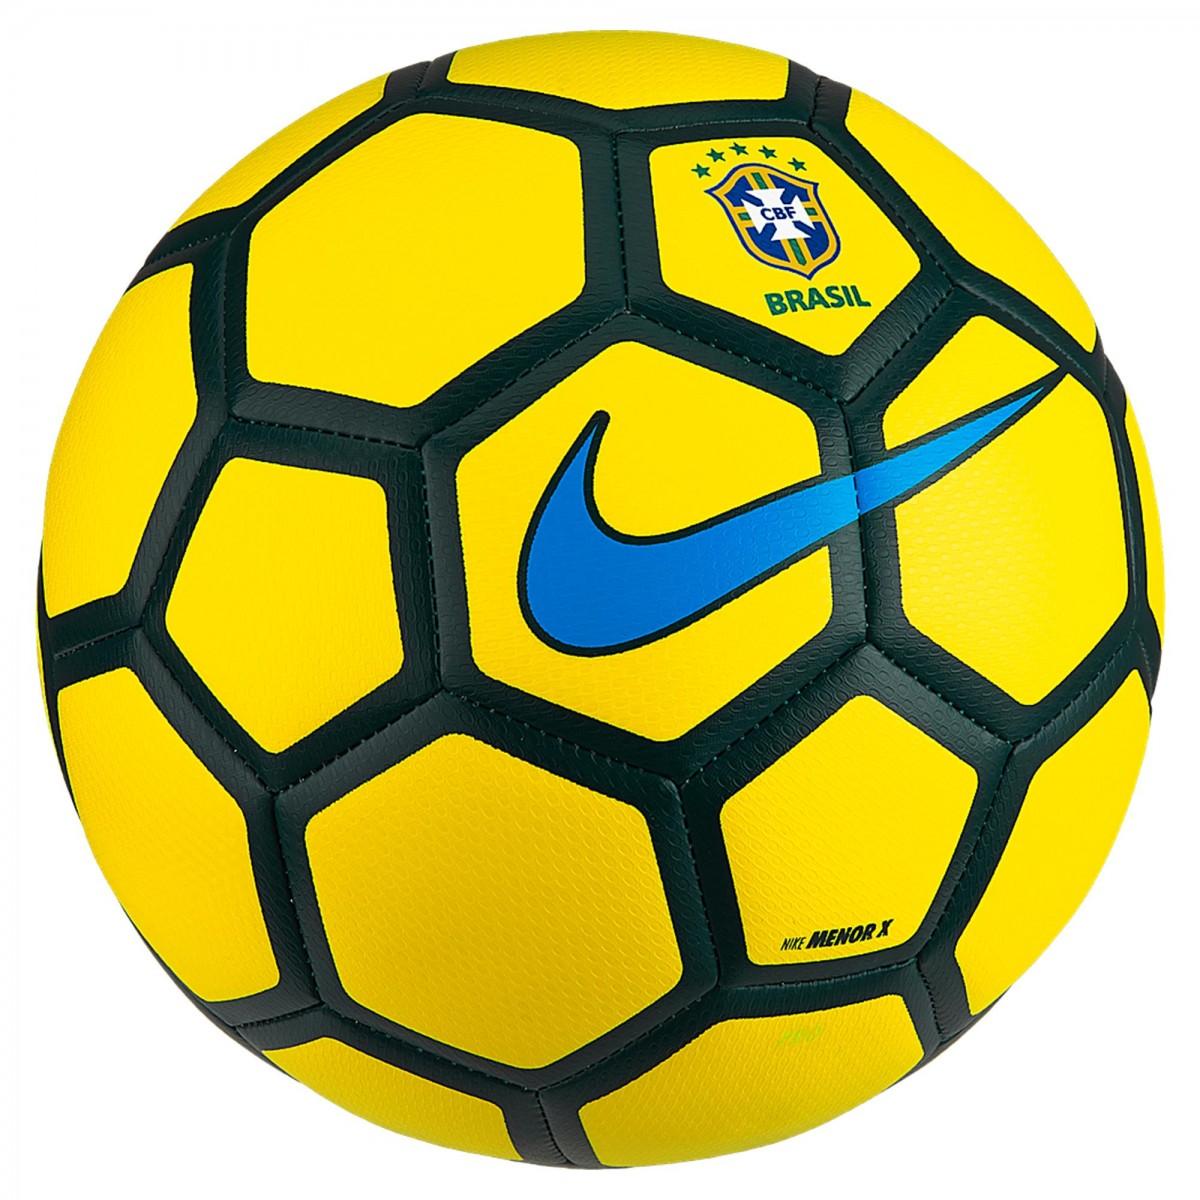 b832999de5f5d Bizz Store - Bola FootballX Menor CBF Futsal Nike Amarela